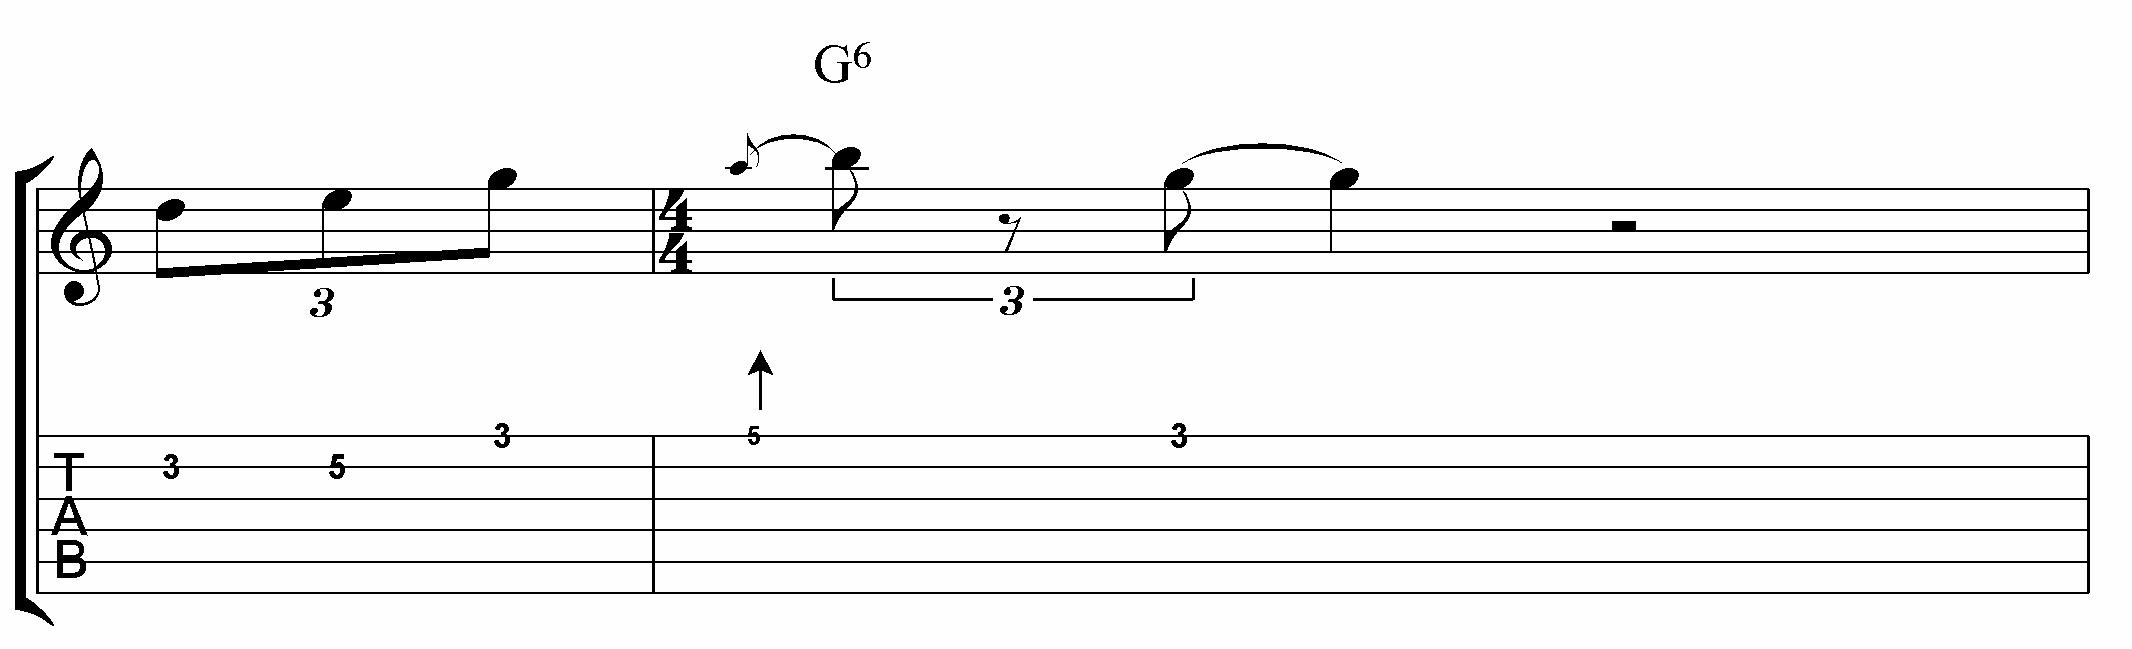 Learn 5 Essential BB King Licks Today - Jamie Holroyd Guitar